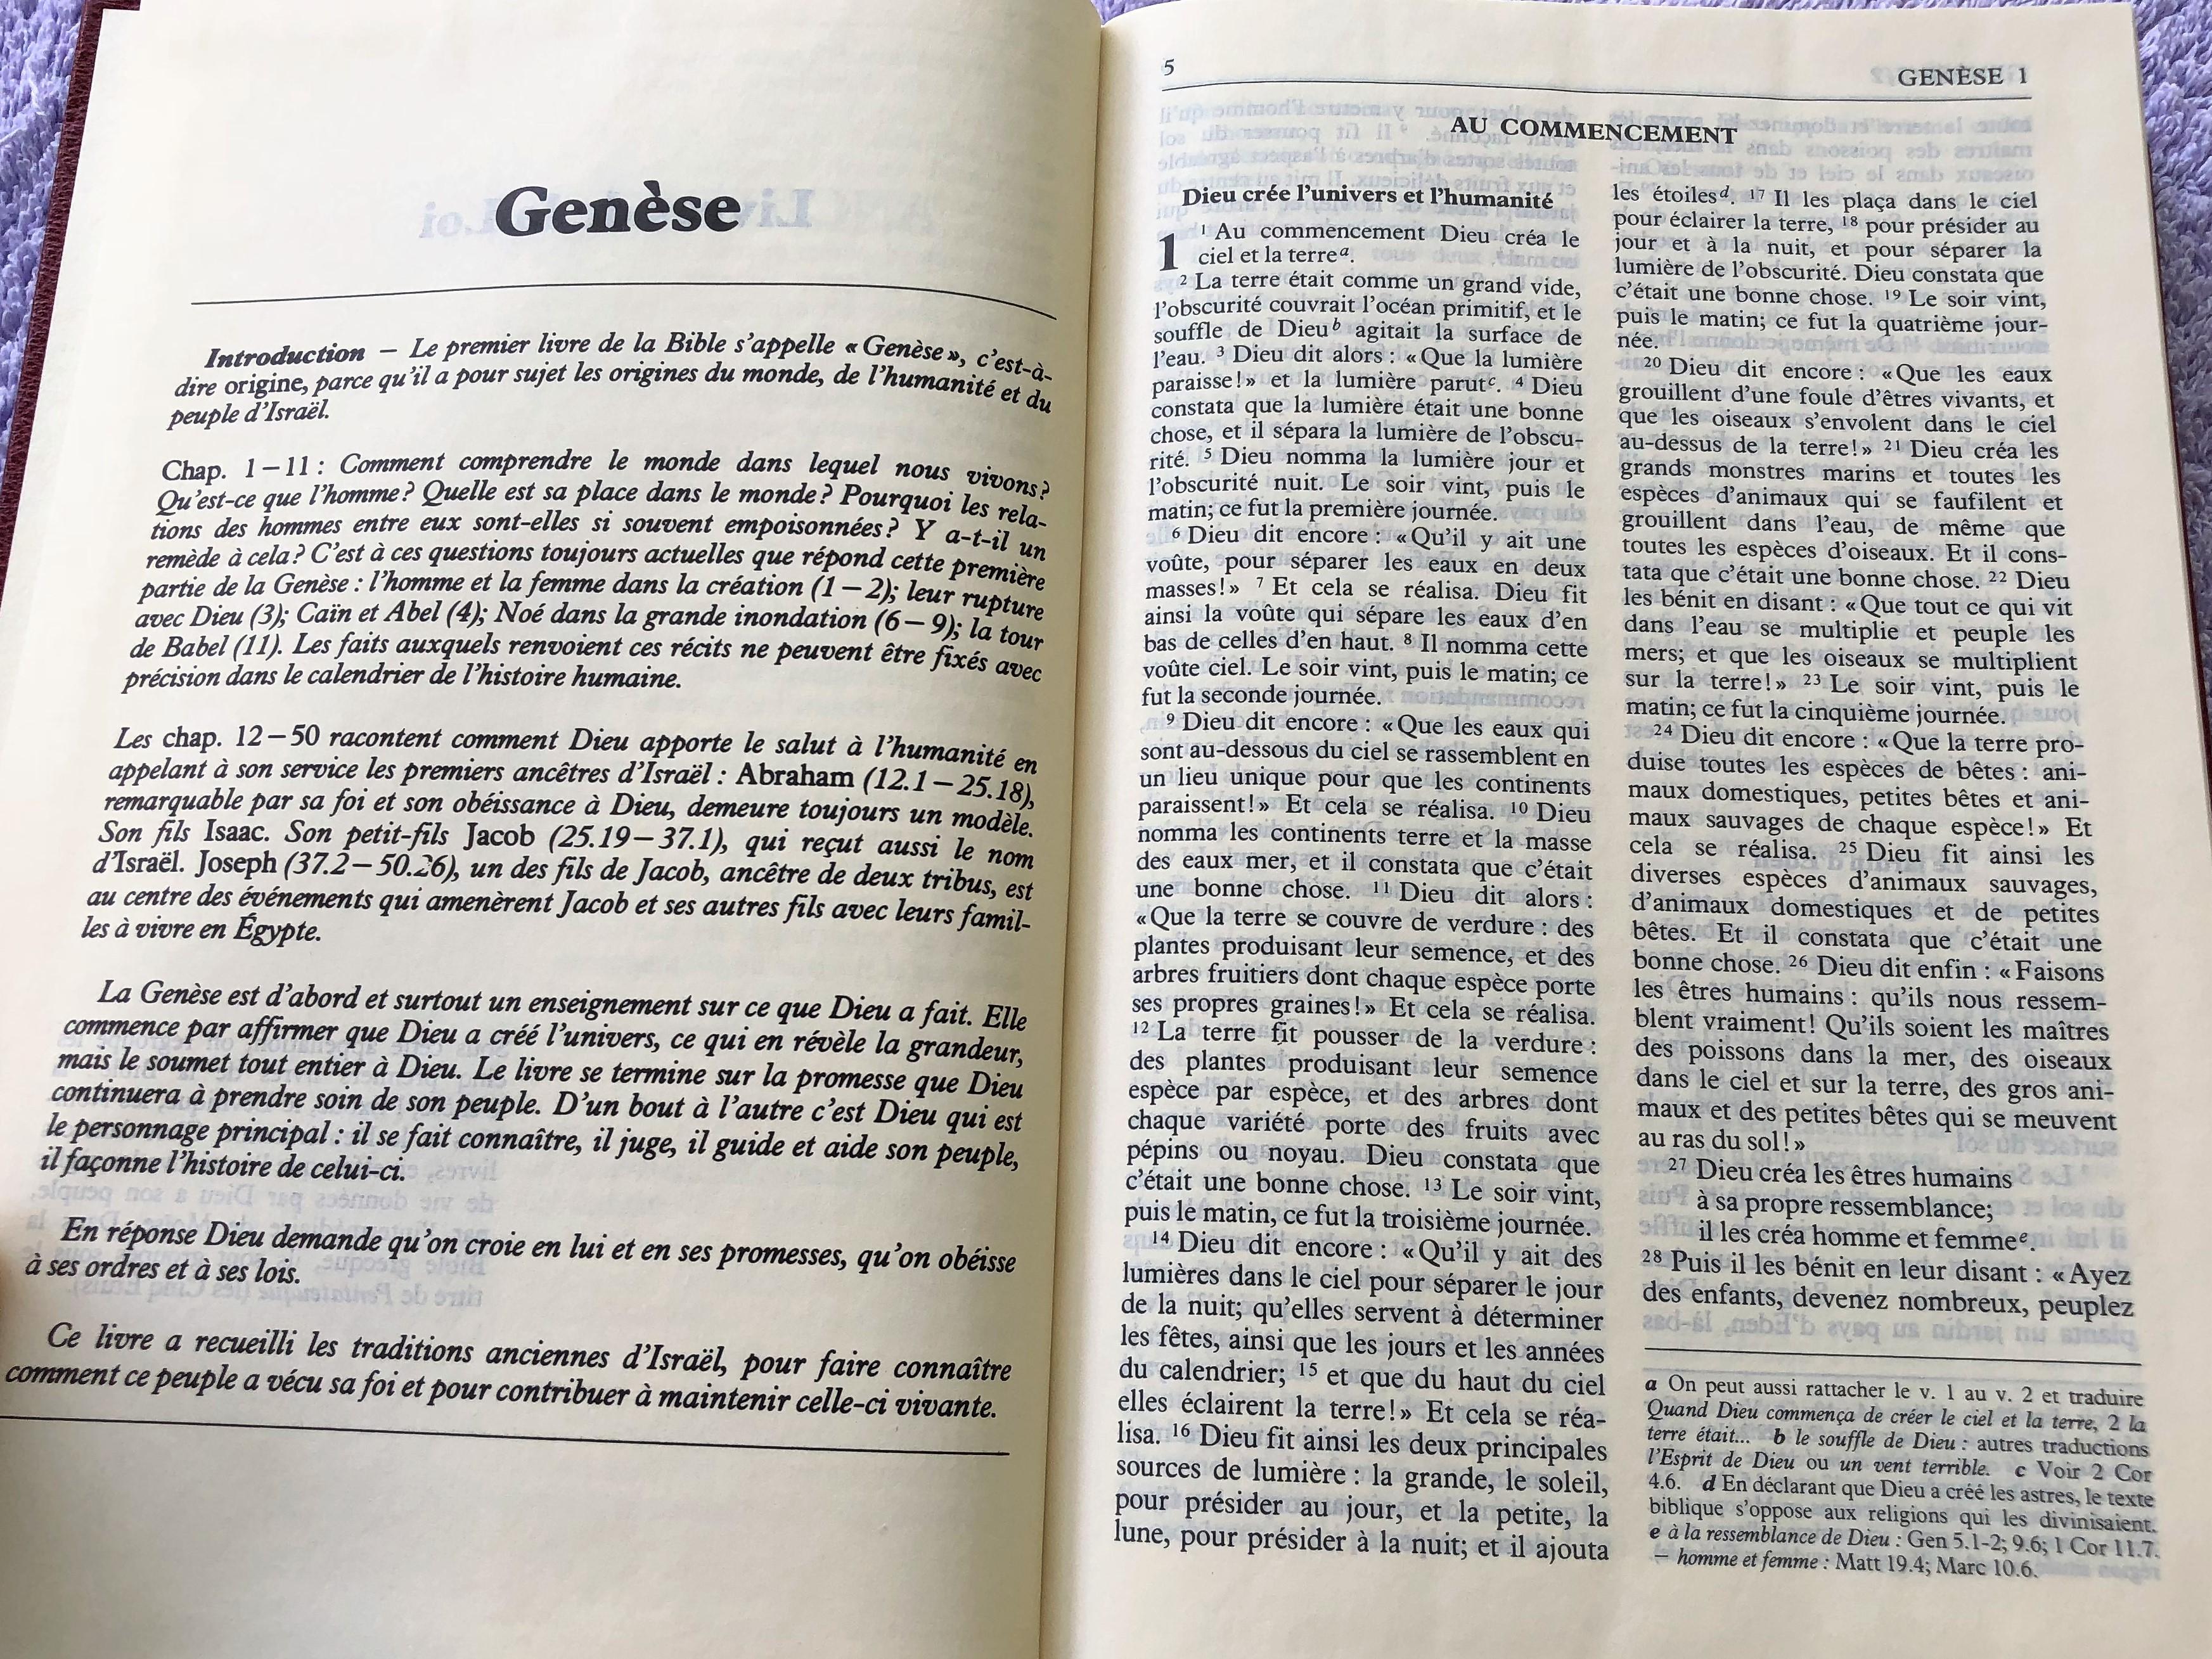 french-bible-1994-print-fch063-7-.jpg